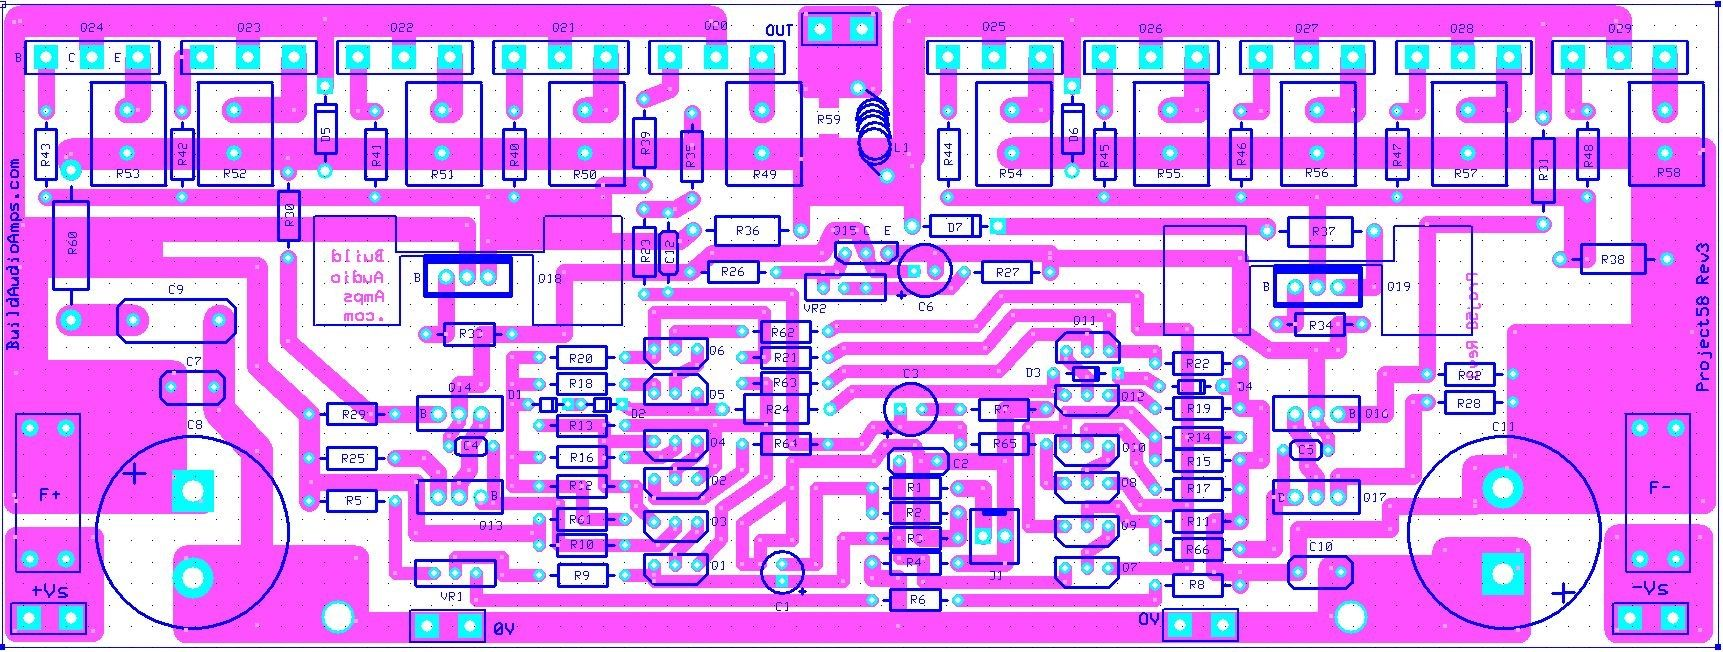 Amplifier Circuit Diagram With Pcb Layout Efcaviation Com Fb Stk 4050 8211 200watt Power